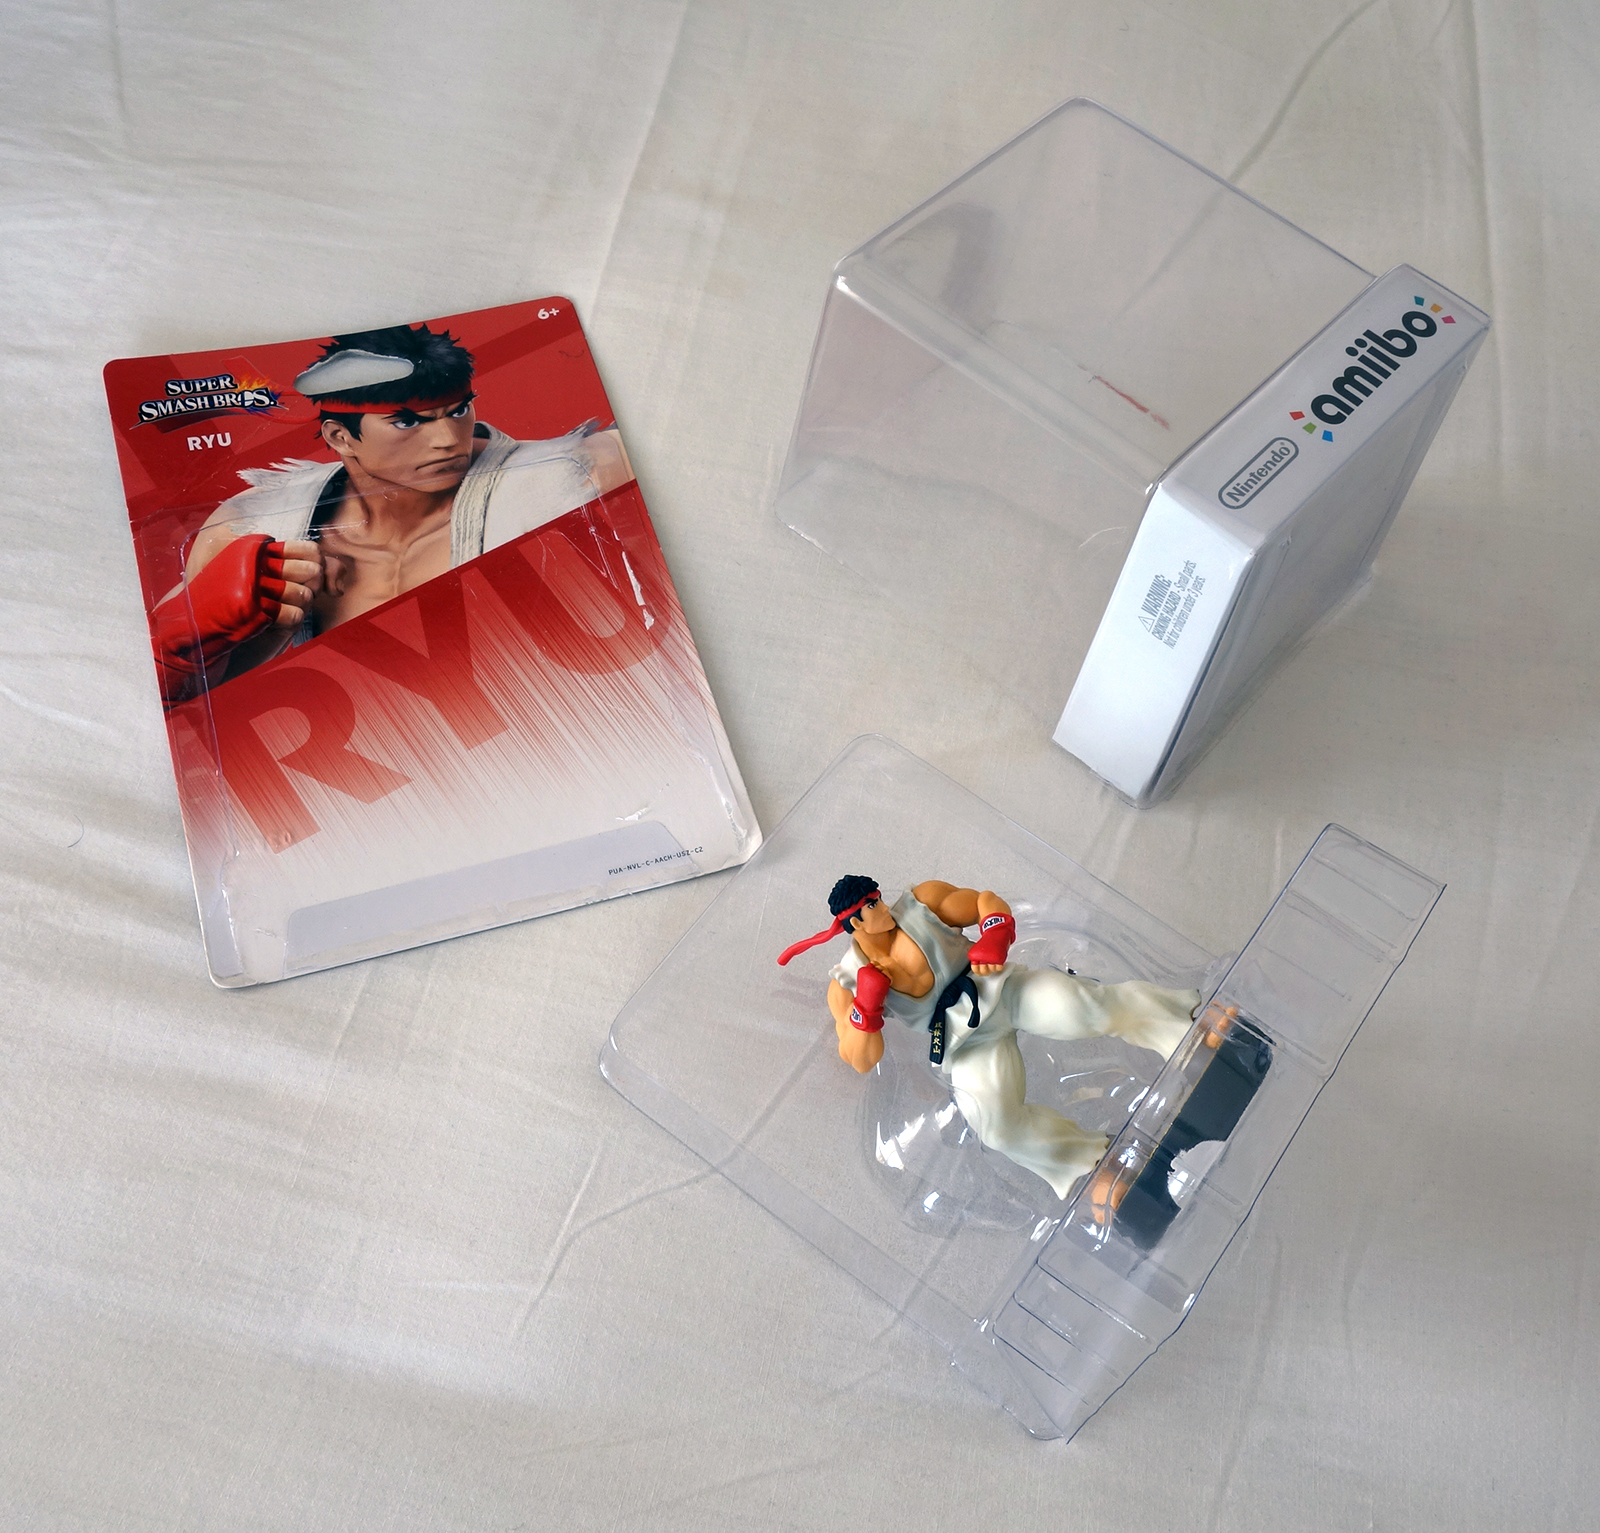 RYU Figurine Nintendo Amiibo Super Smash Bros - Unboxed